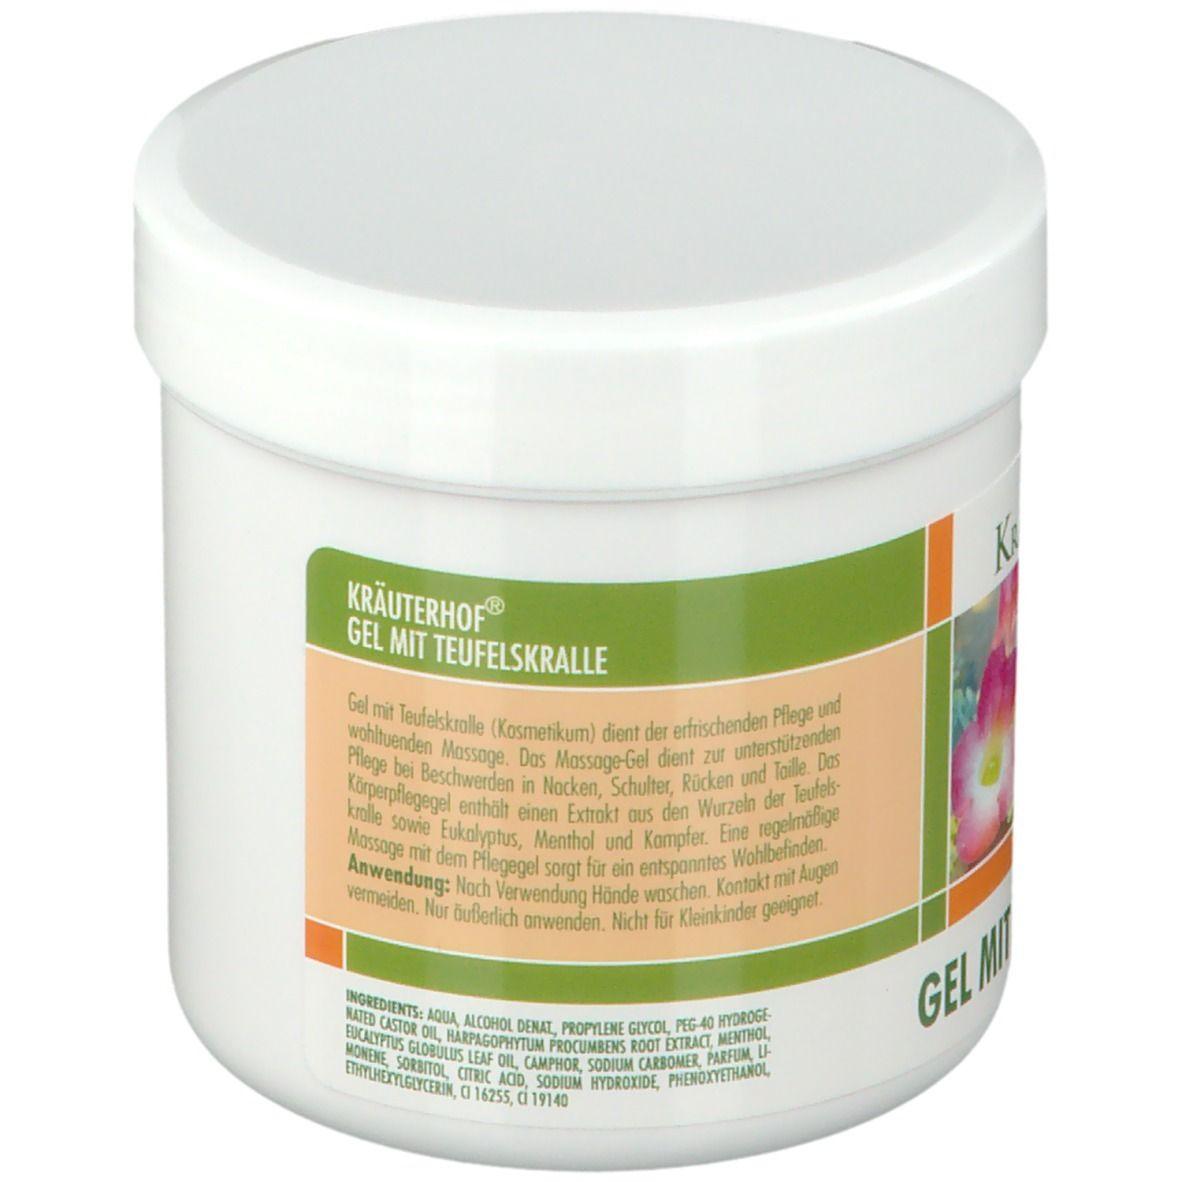 Kräuterhof® Teufelskralle Gel